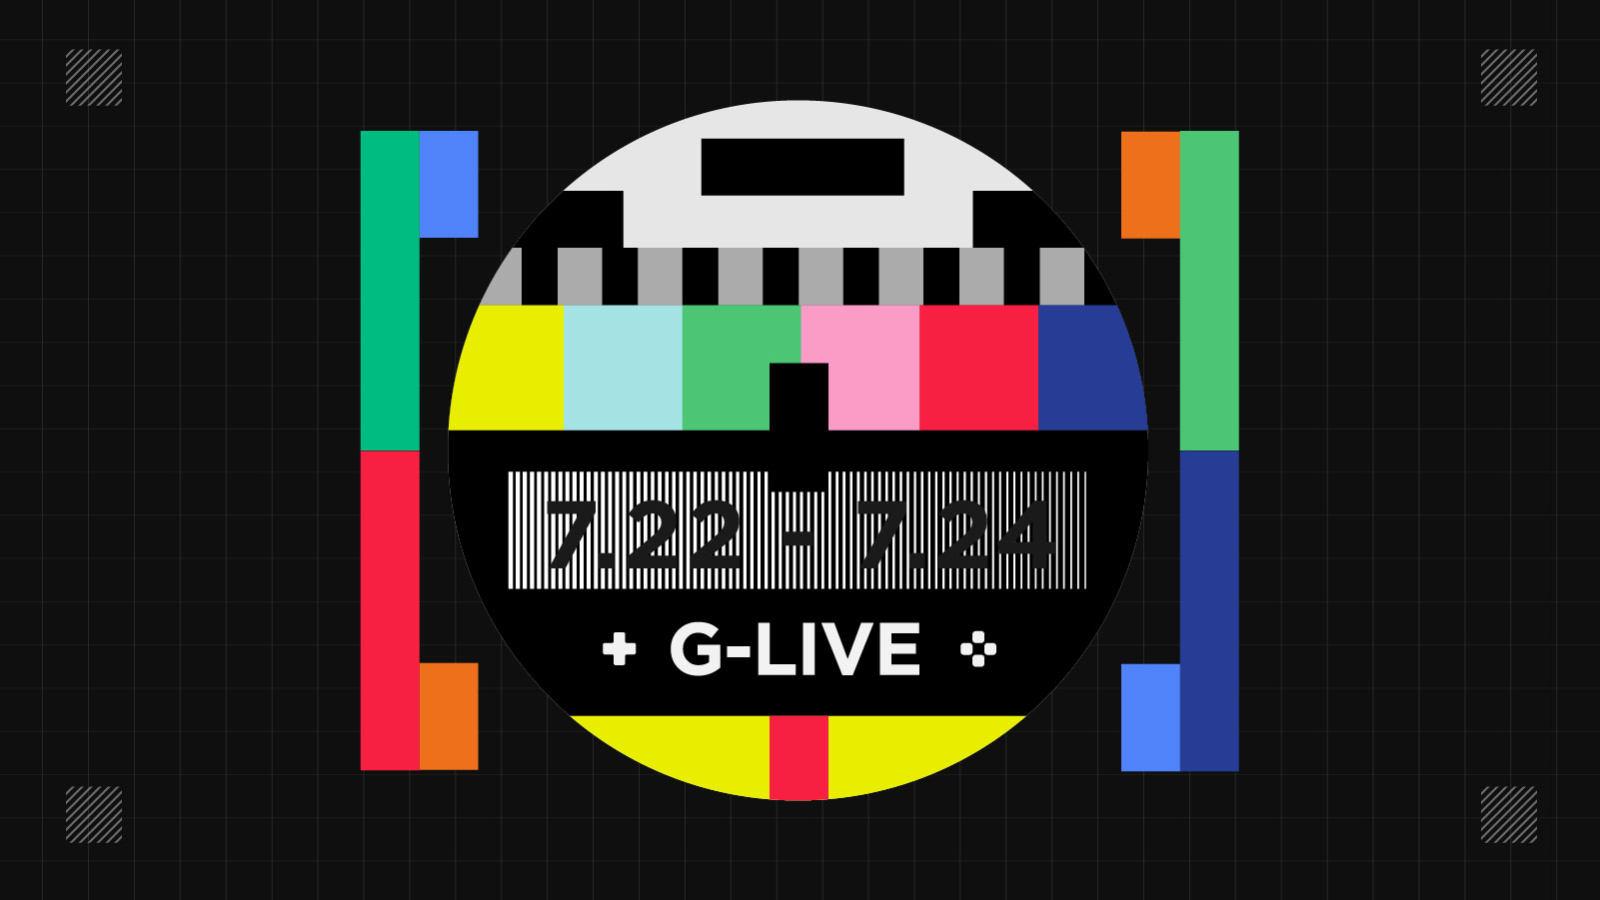 「Glive」本周尝试一档情感专题节目,另外还有Xbox第一方发布会 7.22~7.24常规直播预告